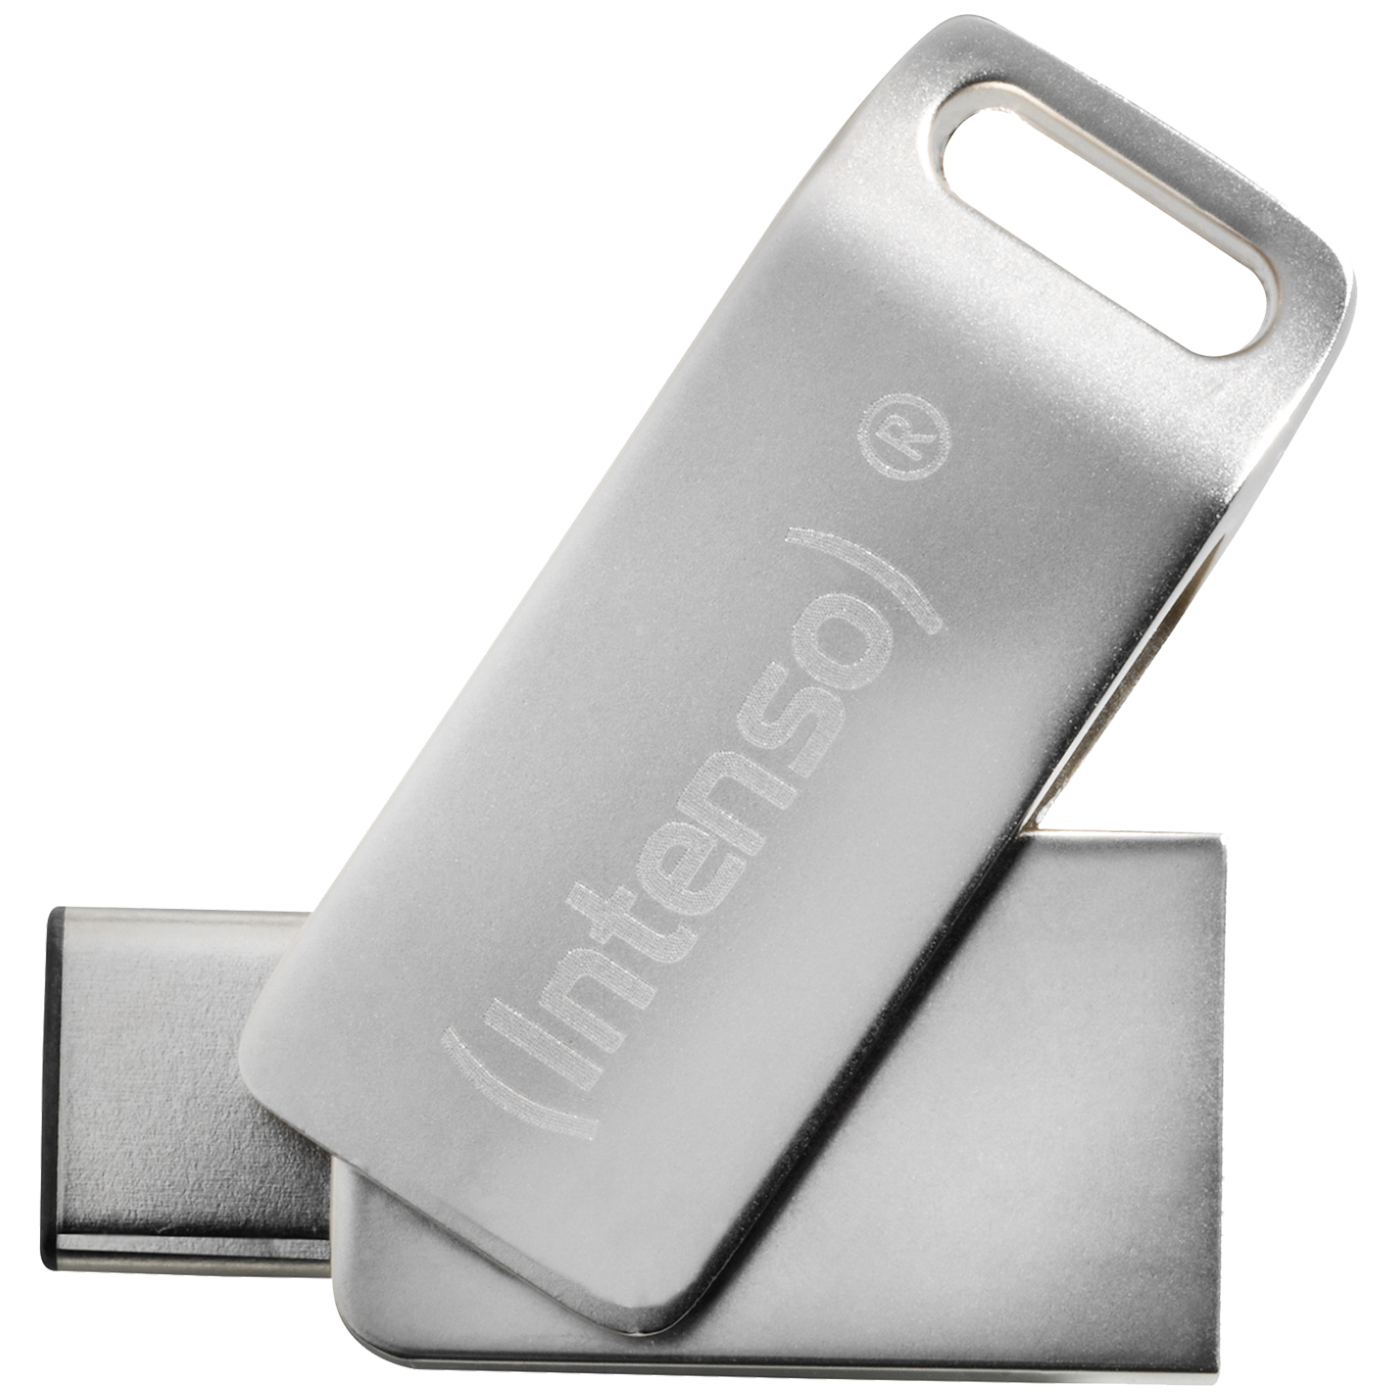 (Intenso) - BULK-USB3.0-16GB/cMobile Line Pro